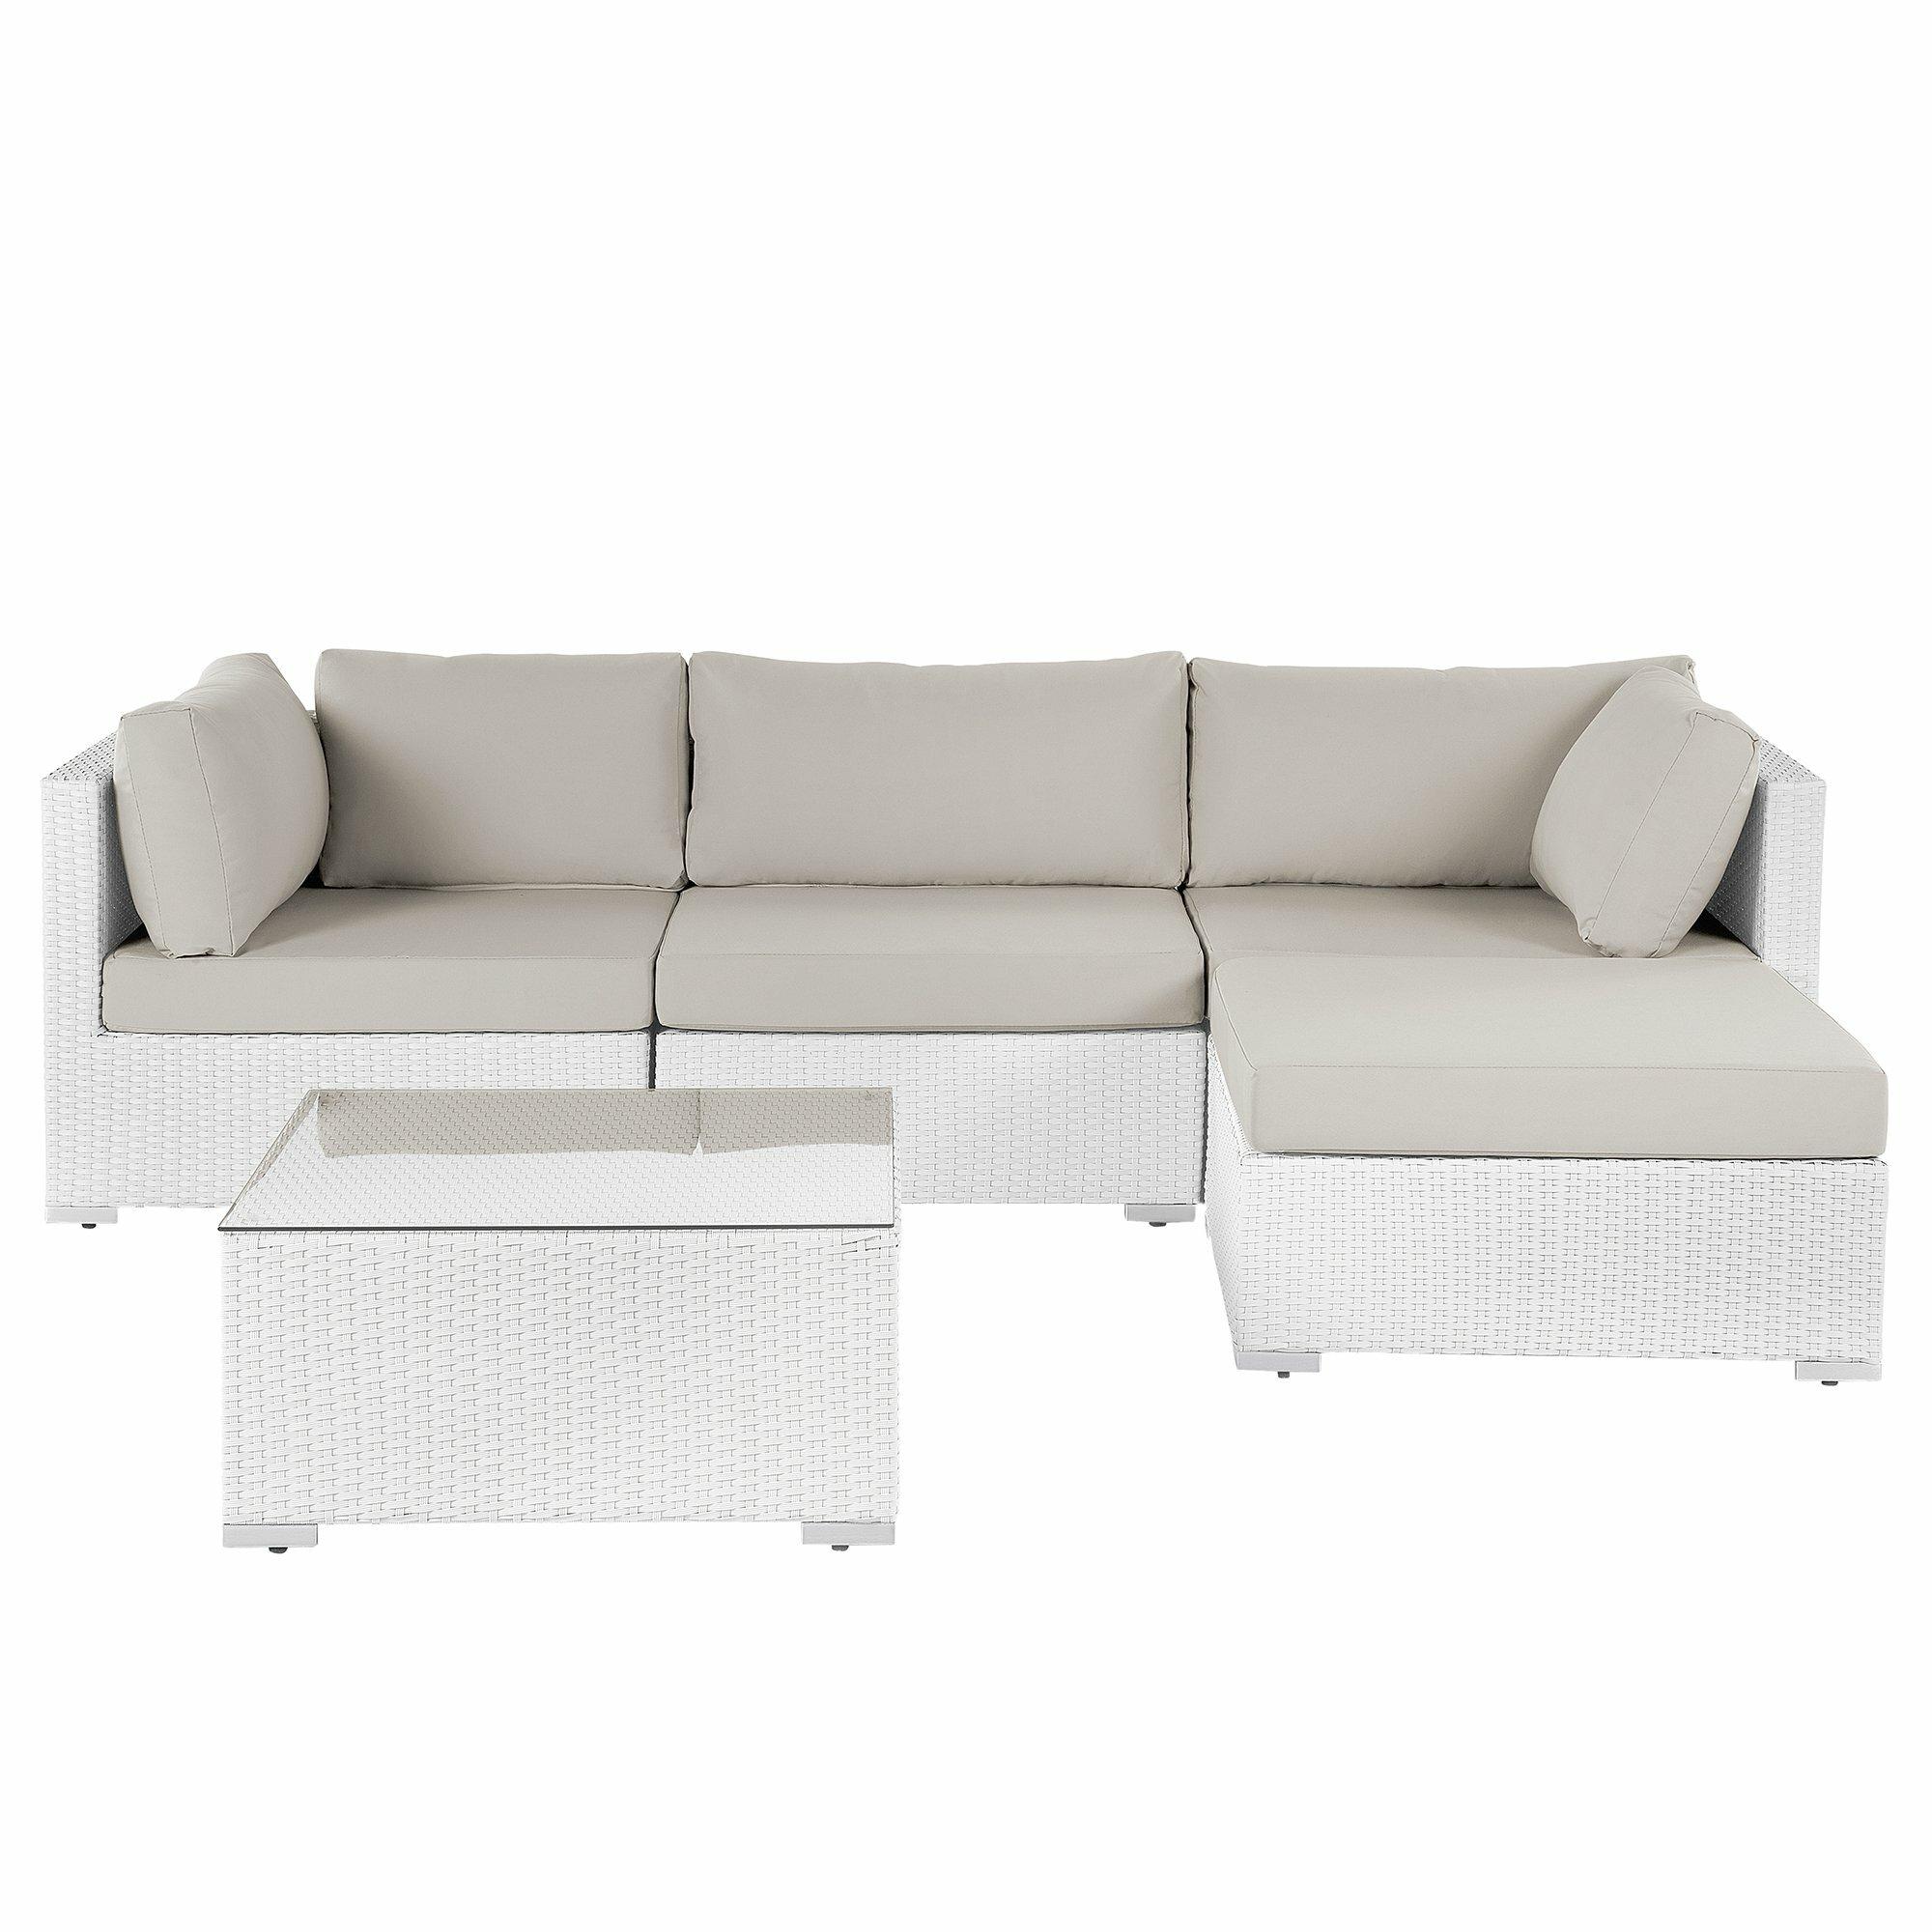 Waverly 4 Seater Rattan Corner Sofa Set